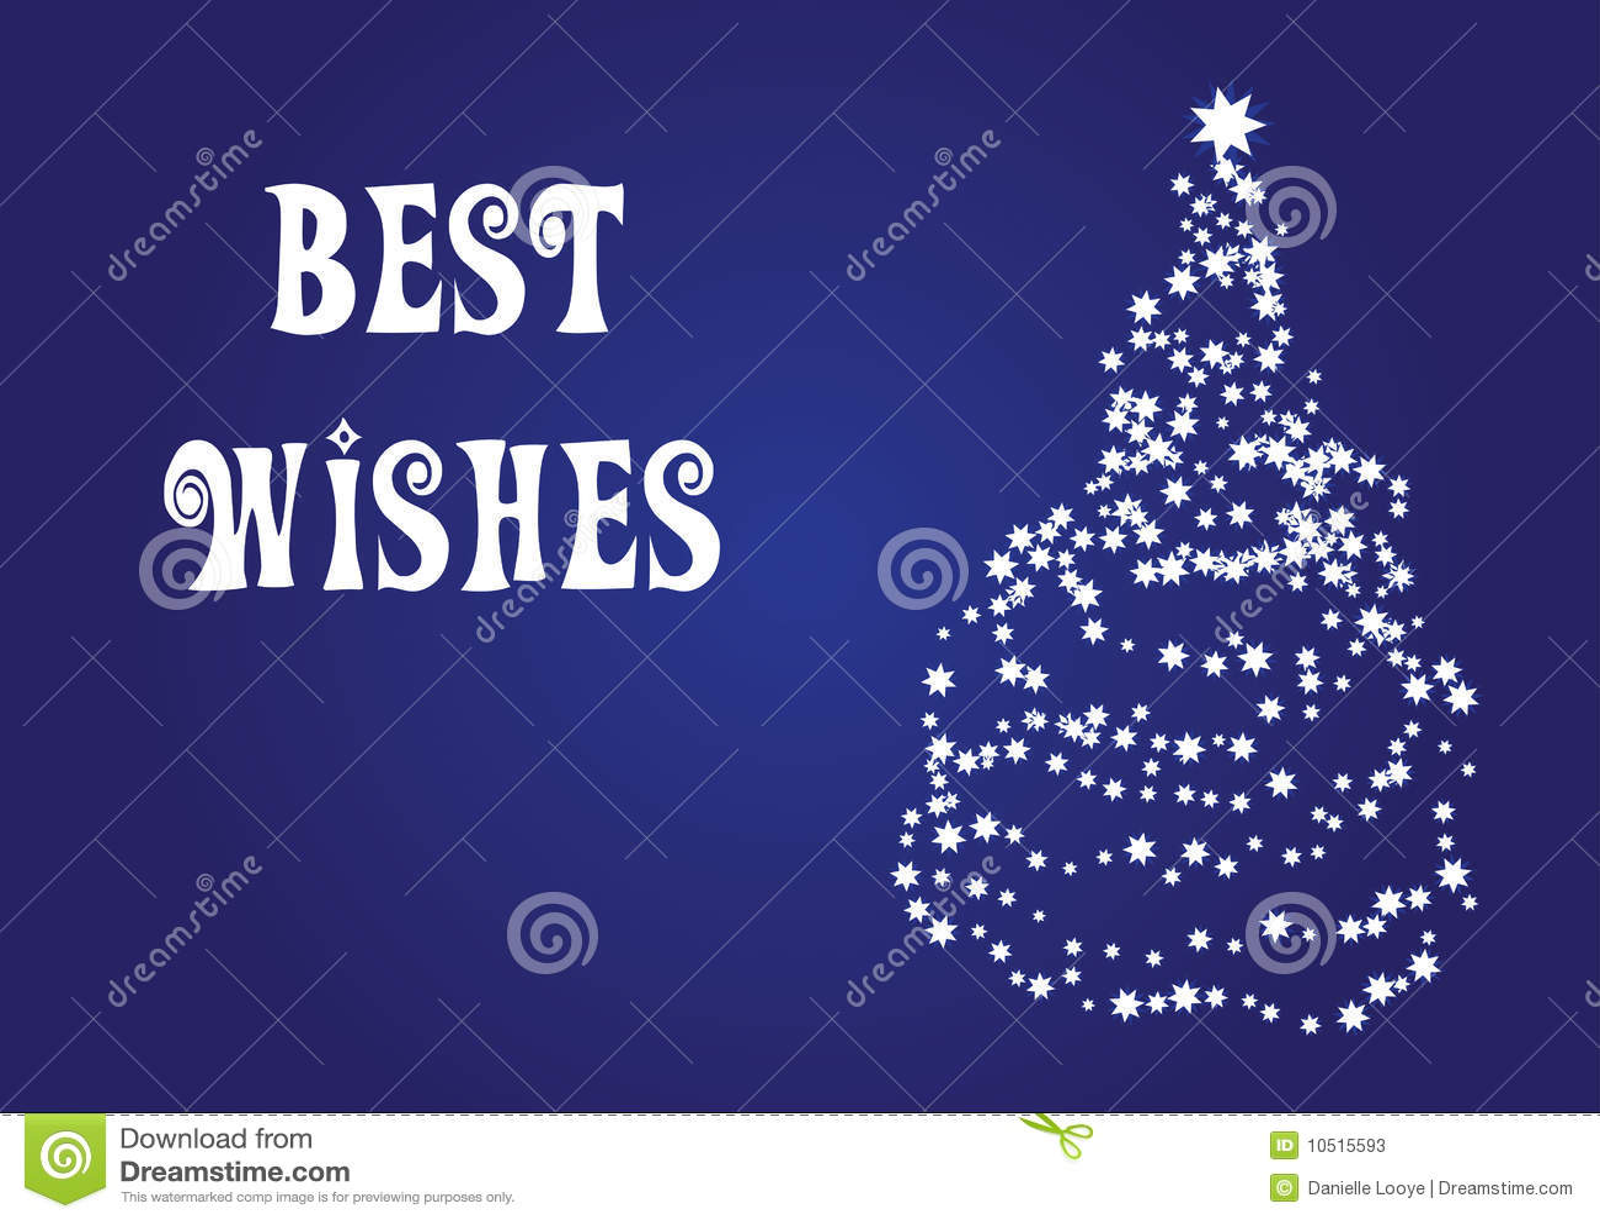 Make Your Wish November 2016